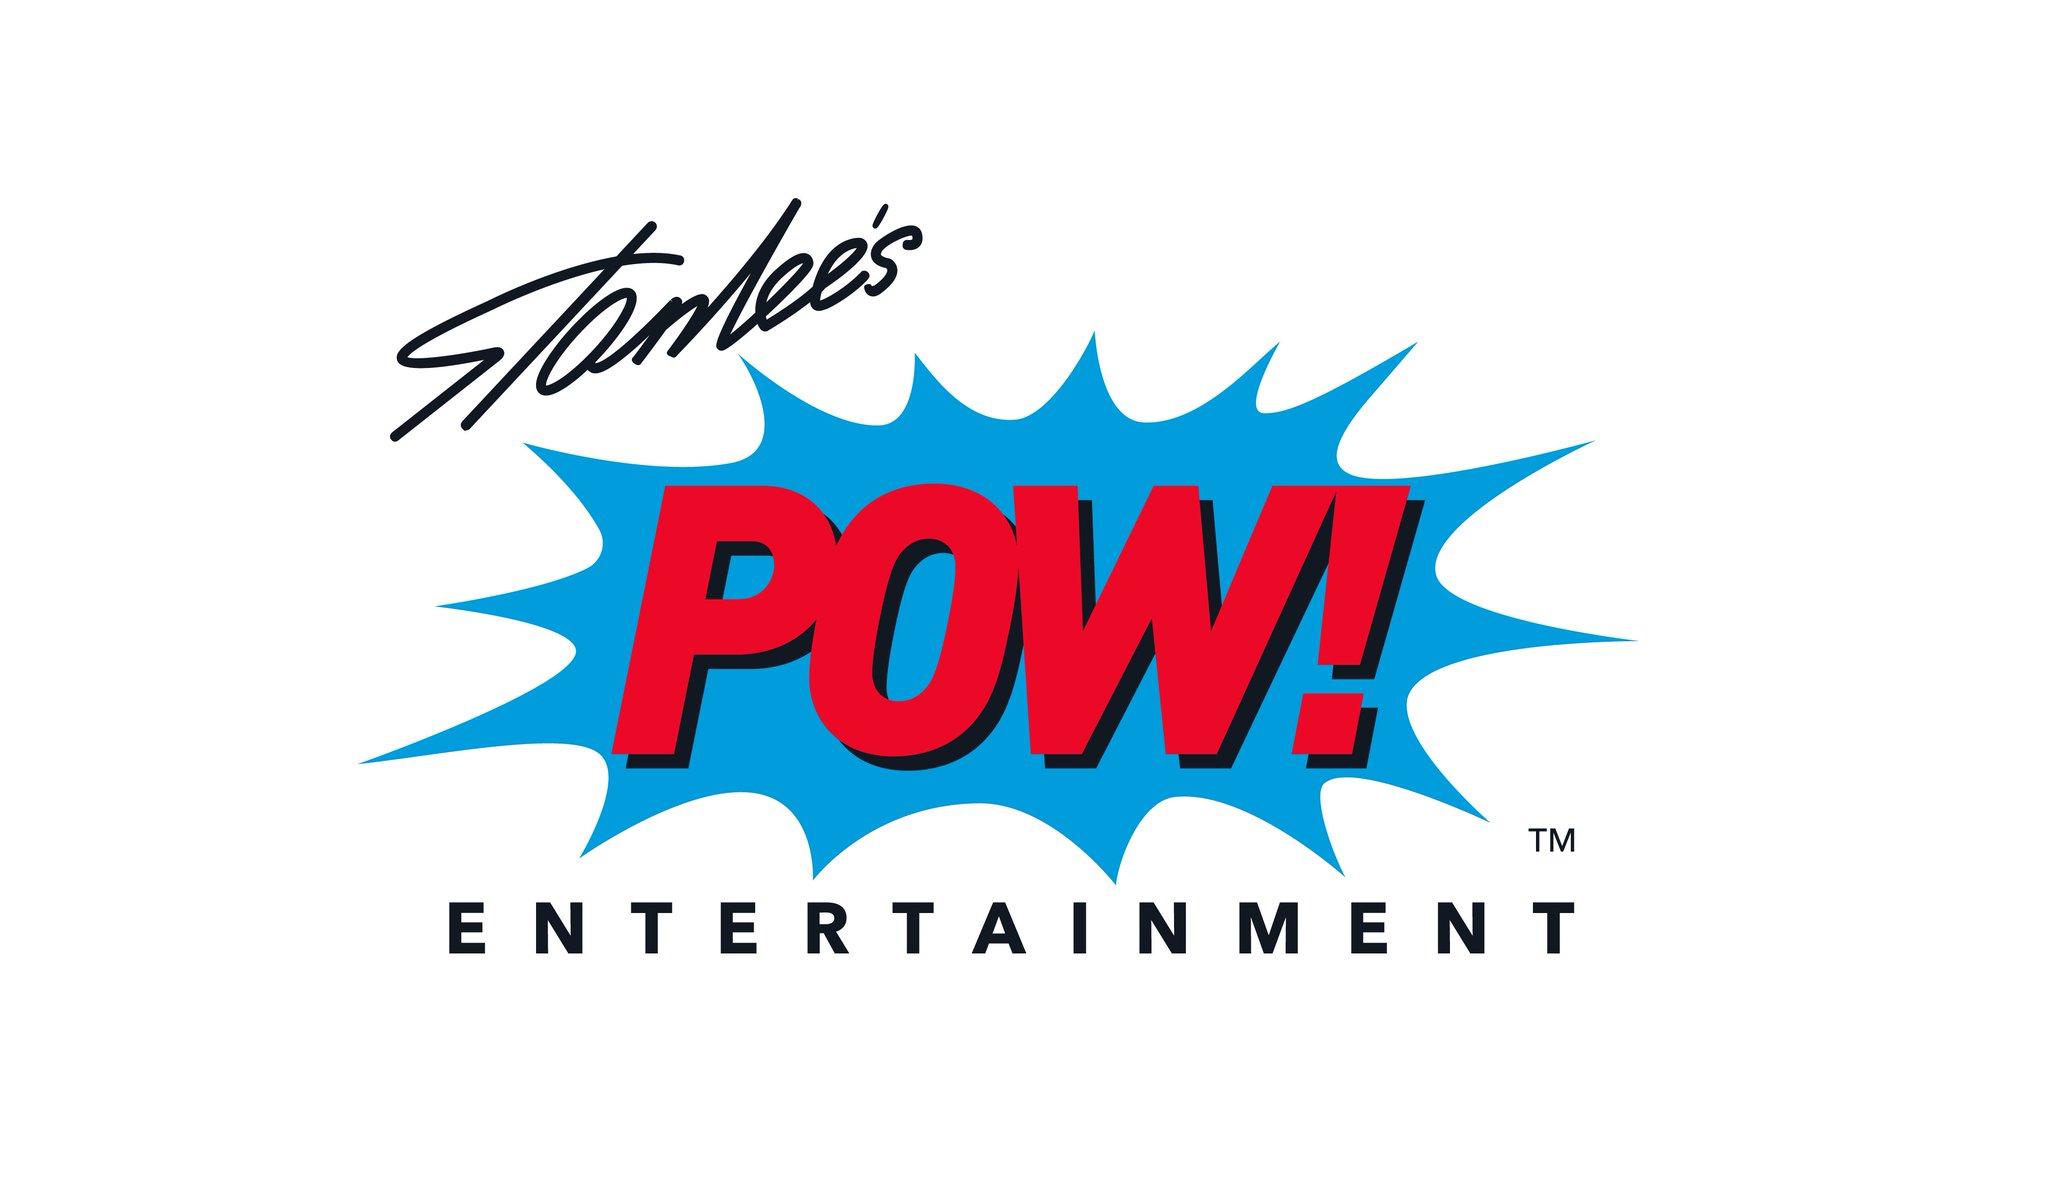 Stan Lee and POW! Entertainment Pledge: https://t.co/85S6DYtrKd https://t.co/4rSA6EiMkI